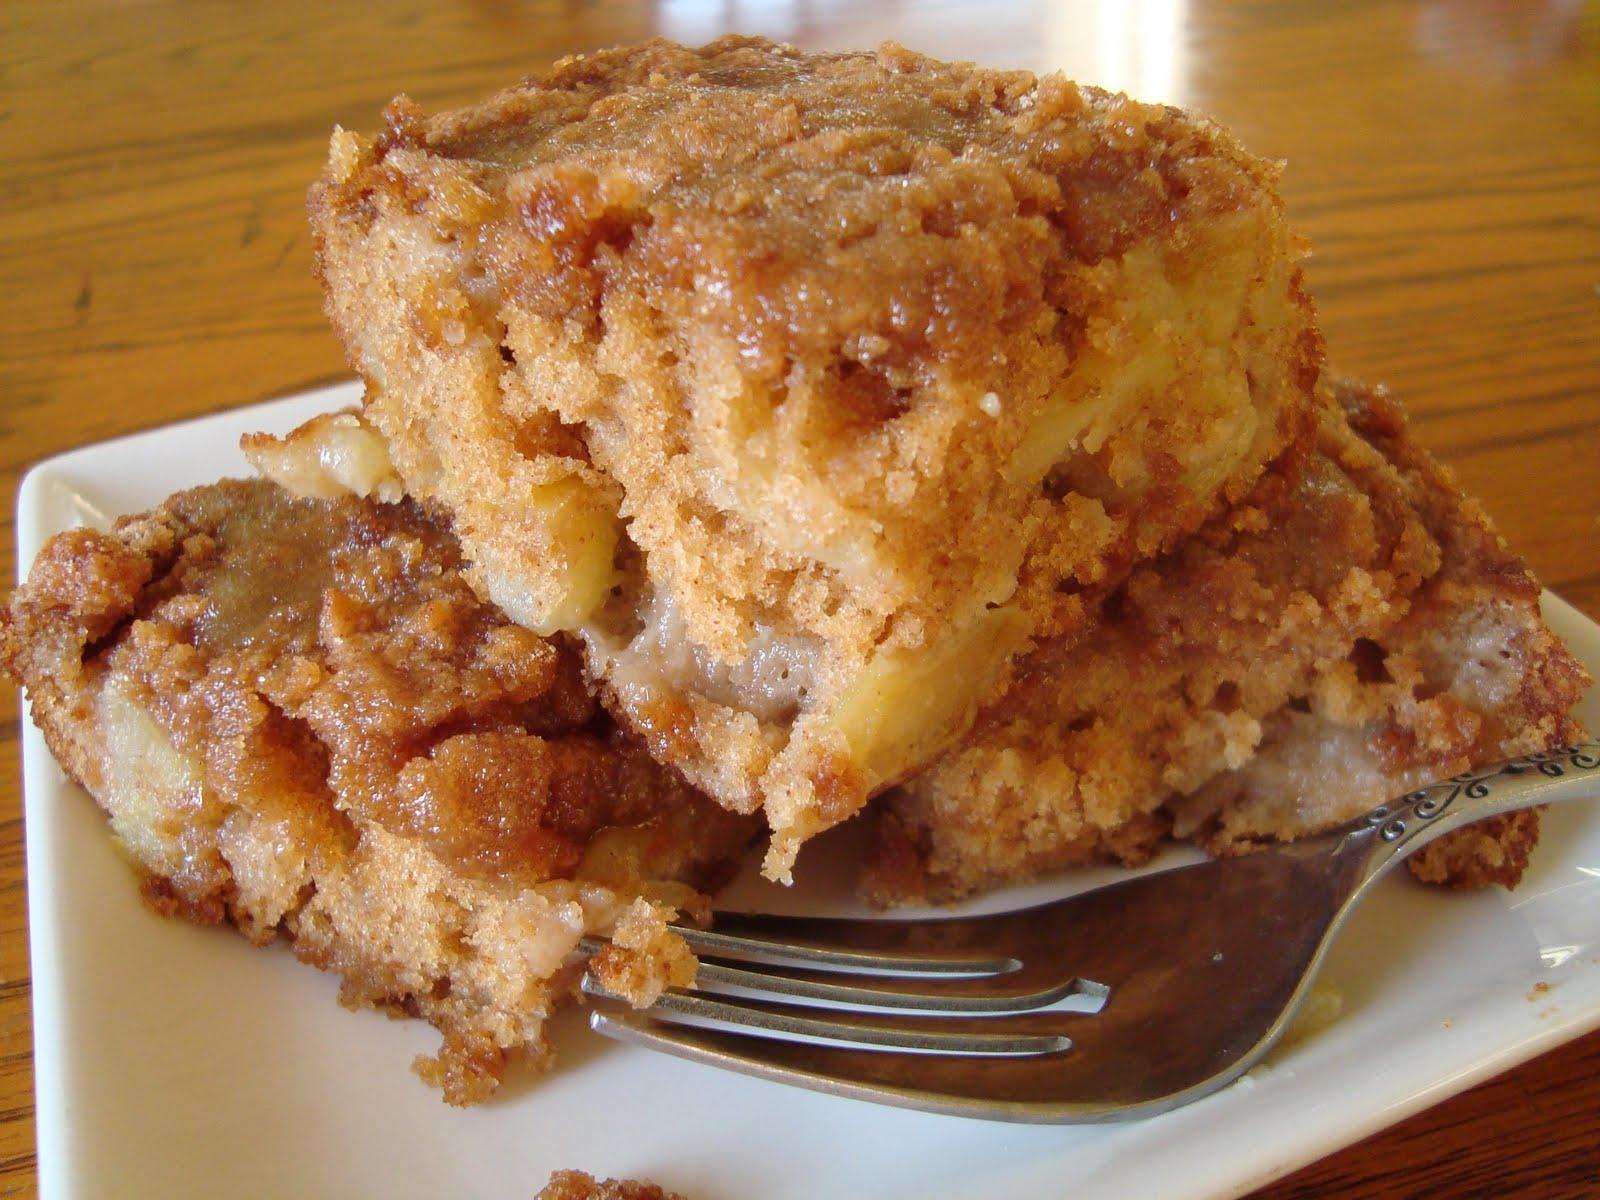 A Hungry Spoon: Apple Coffee Cake